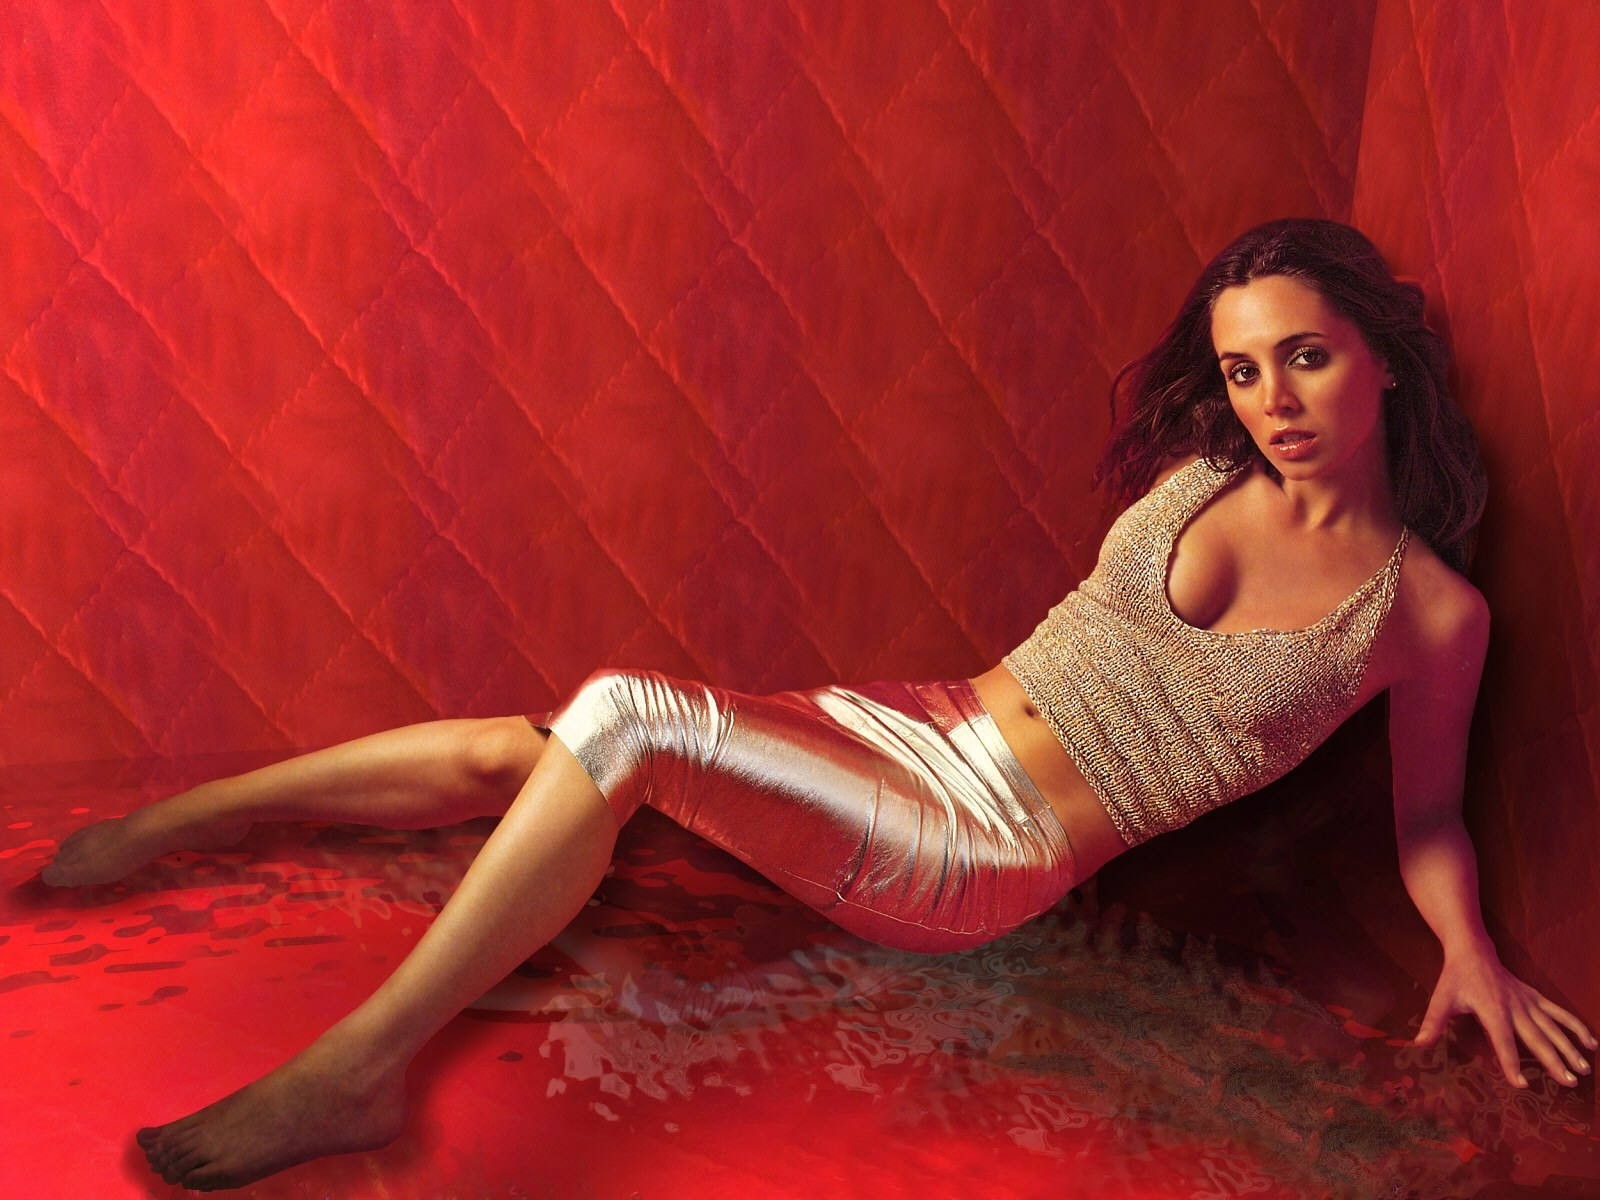 Wallpaper di Eliza Dushku in rosso